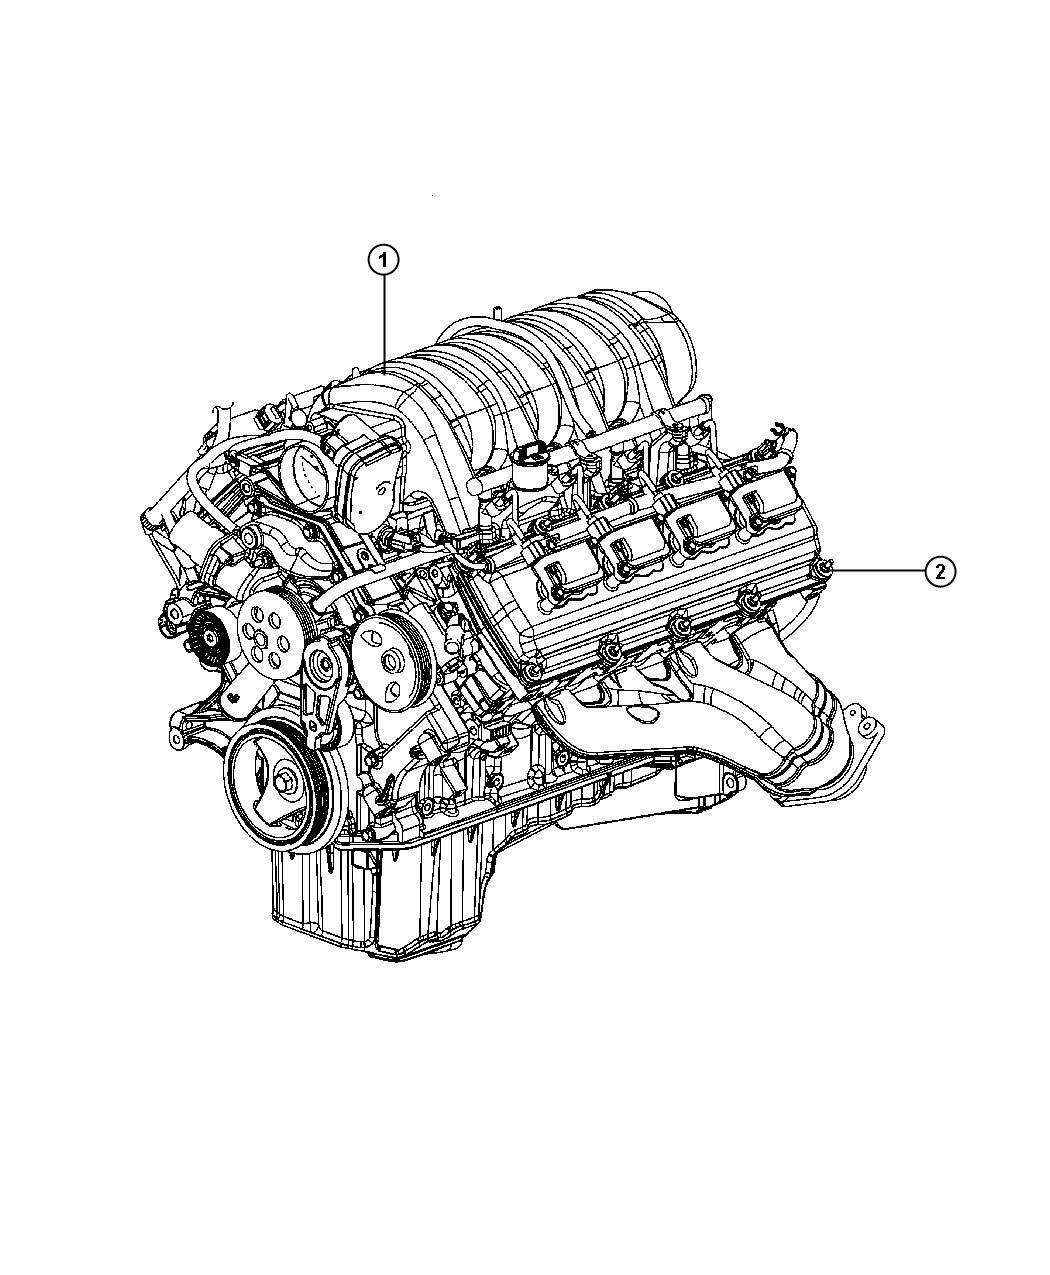 Jeep Grand Cherokee Engine Long Block Esf Service